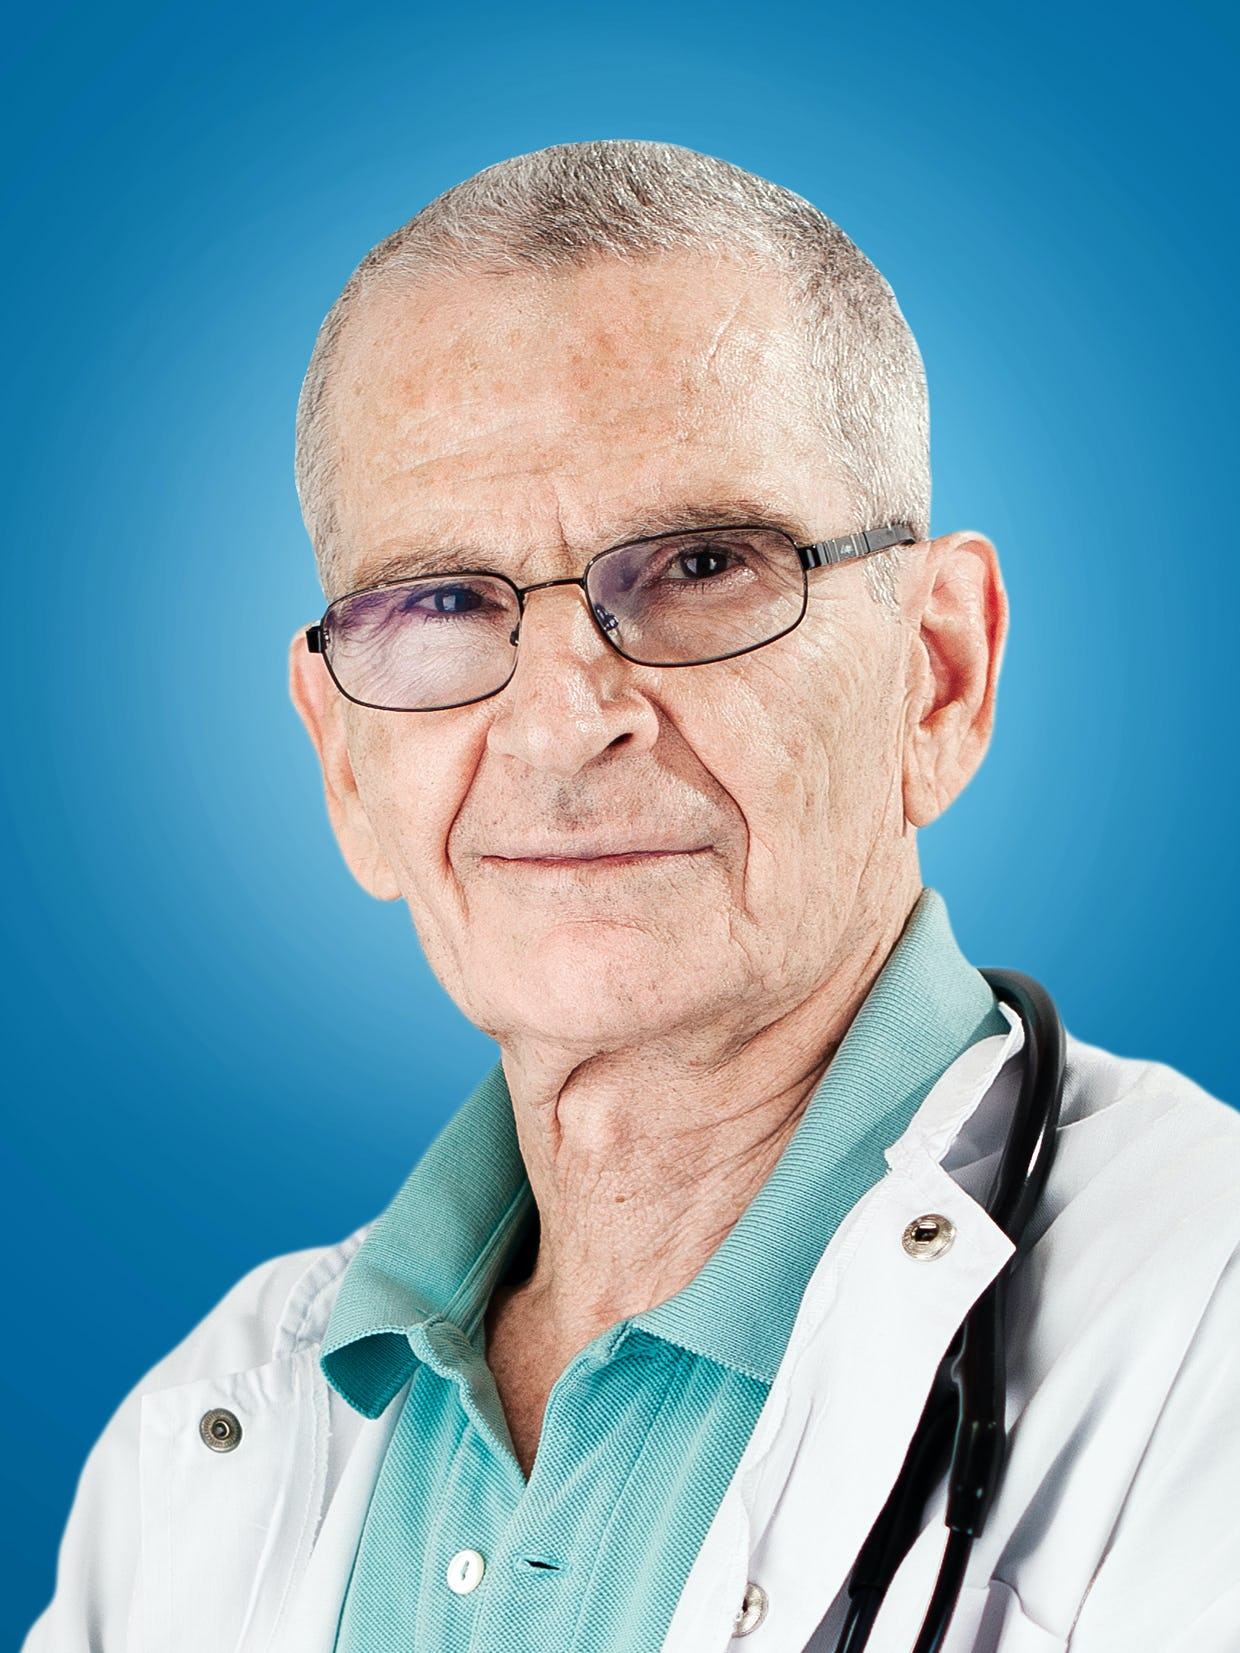 Prof. Dr. Basil Thanopoulos, medic primar cardiolog la Centrele Ares